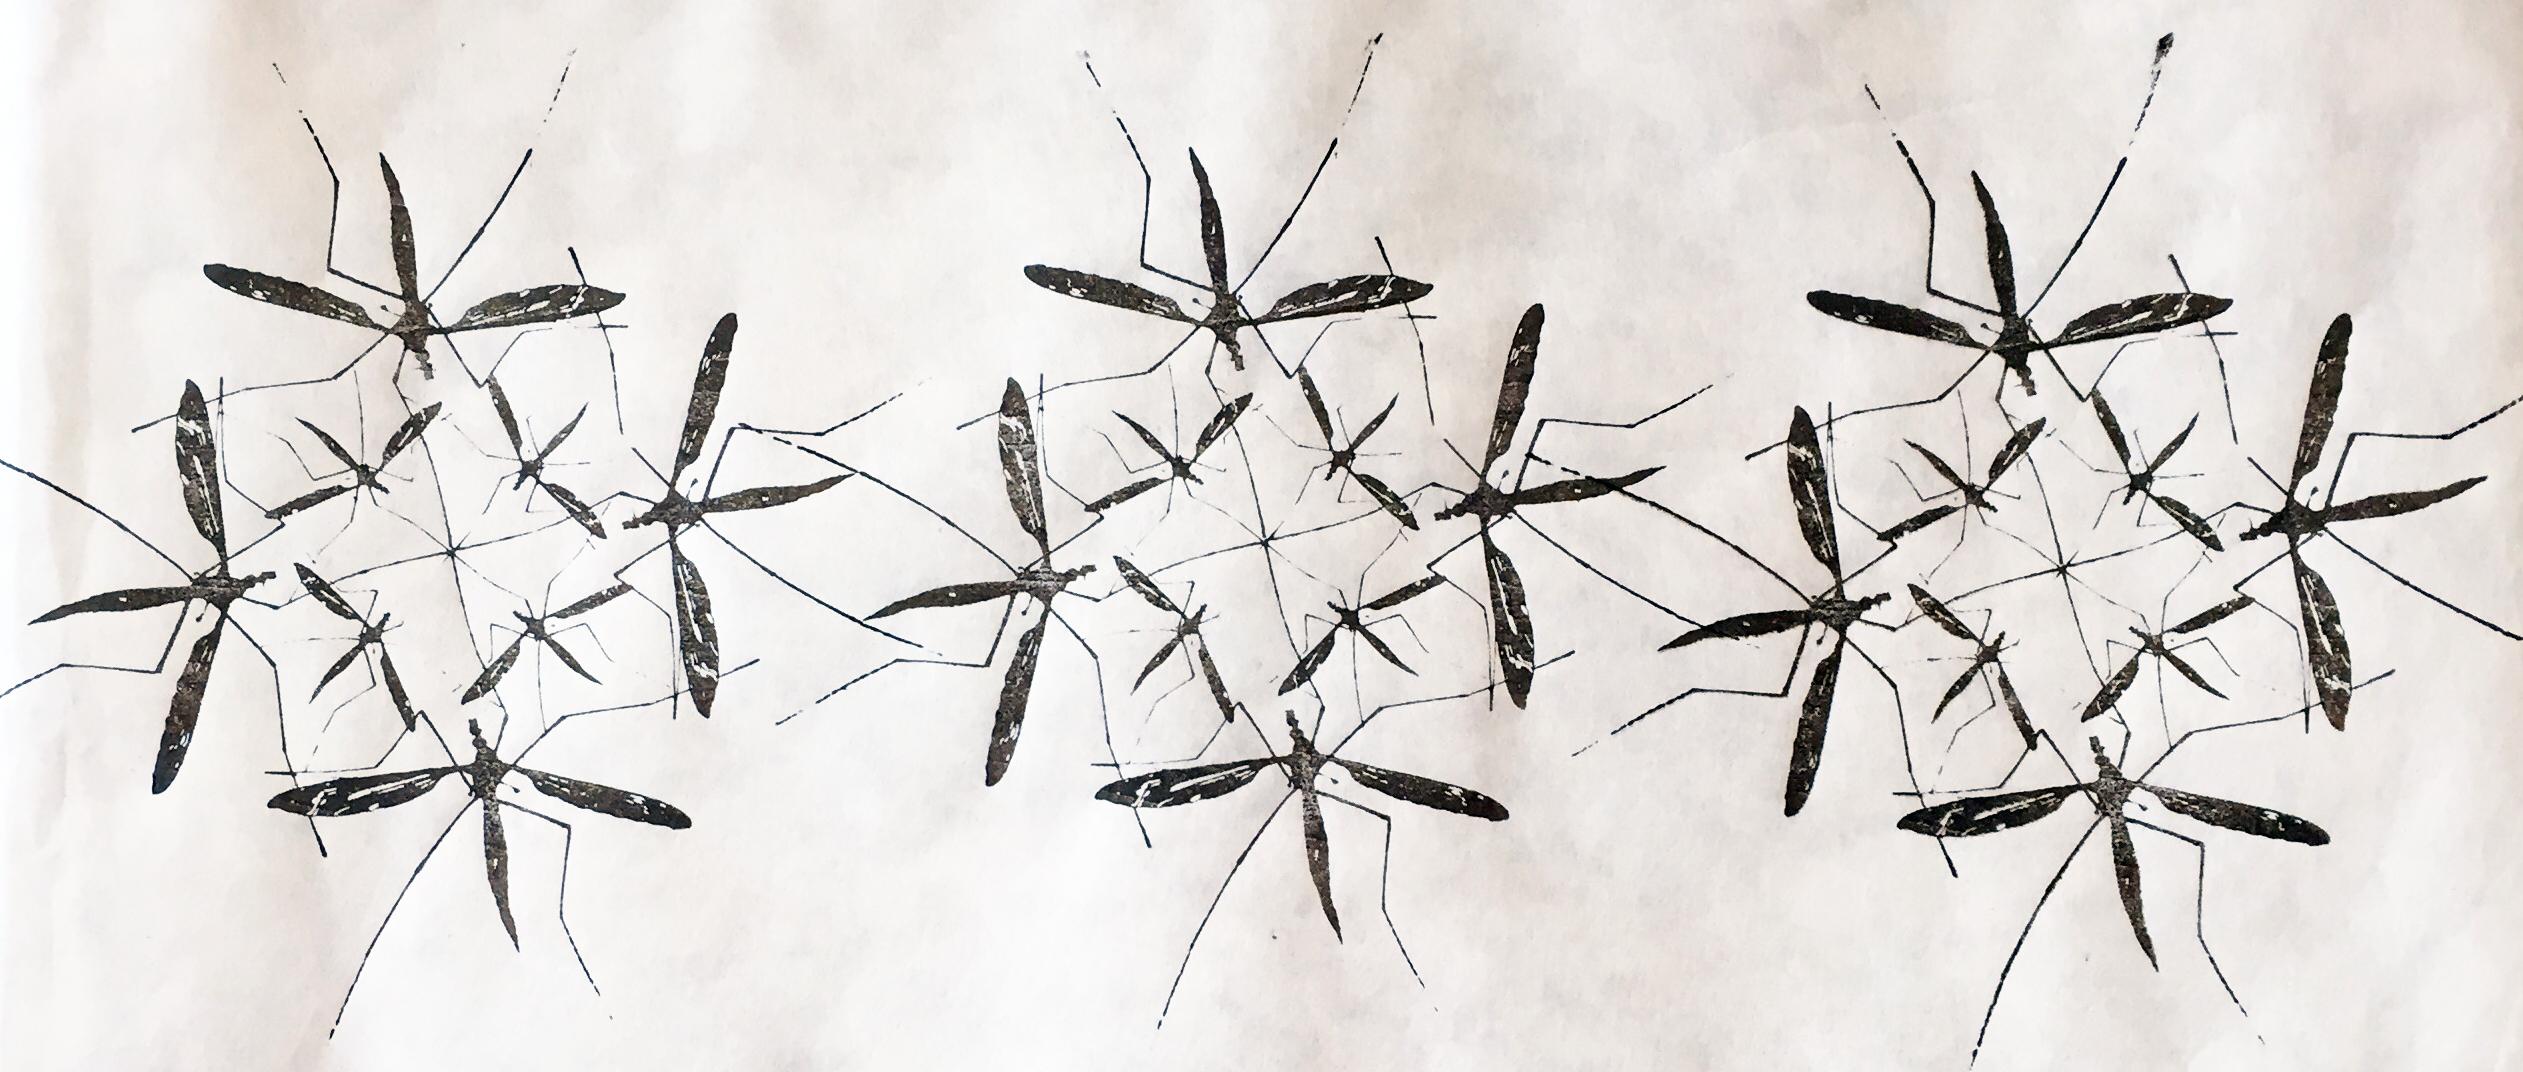 A_Vollmer_Crane Fly Fret (1)